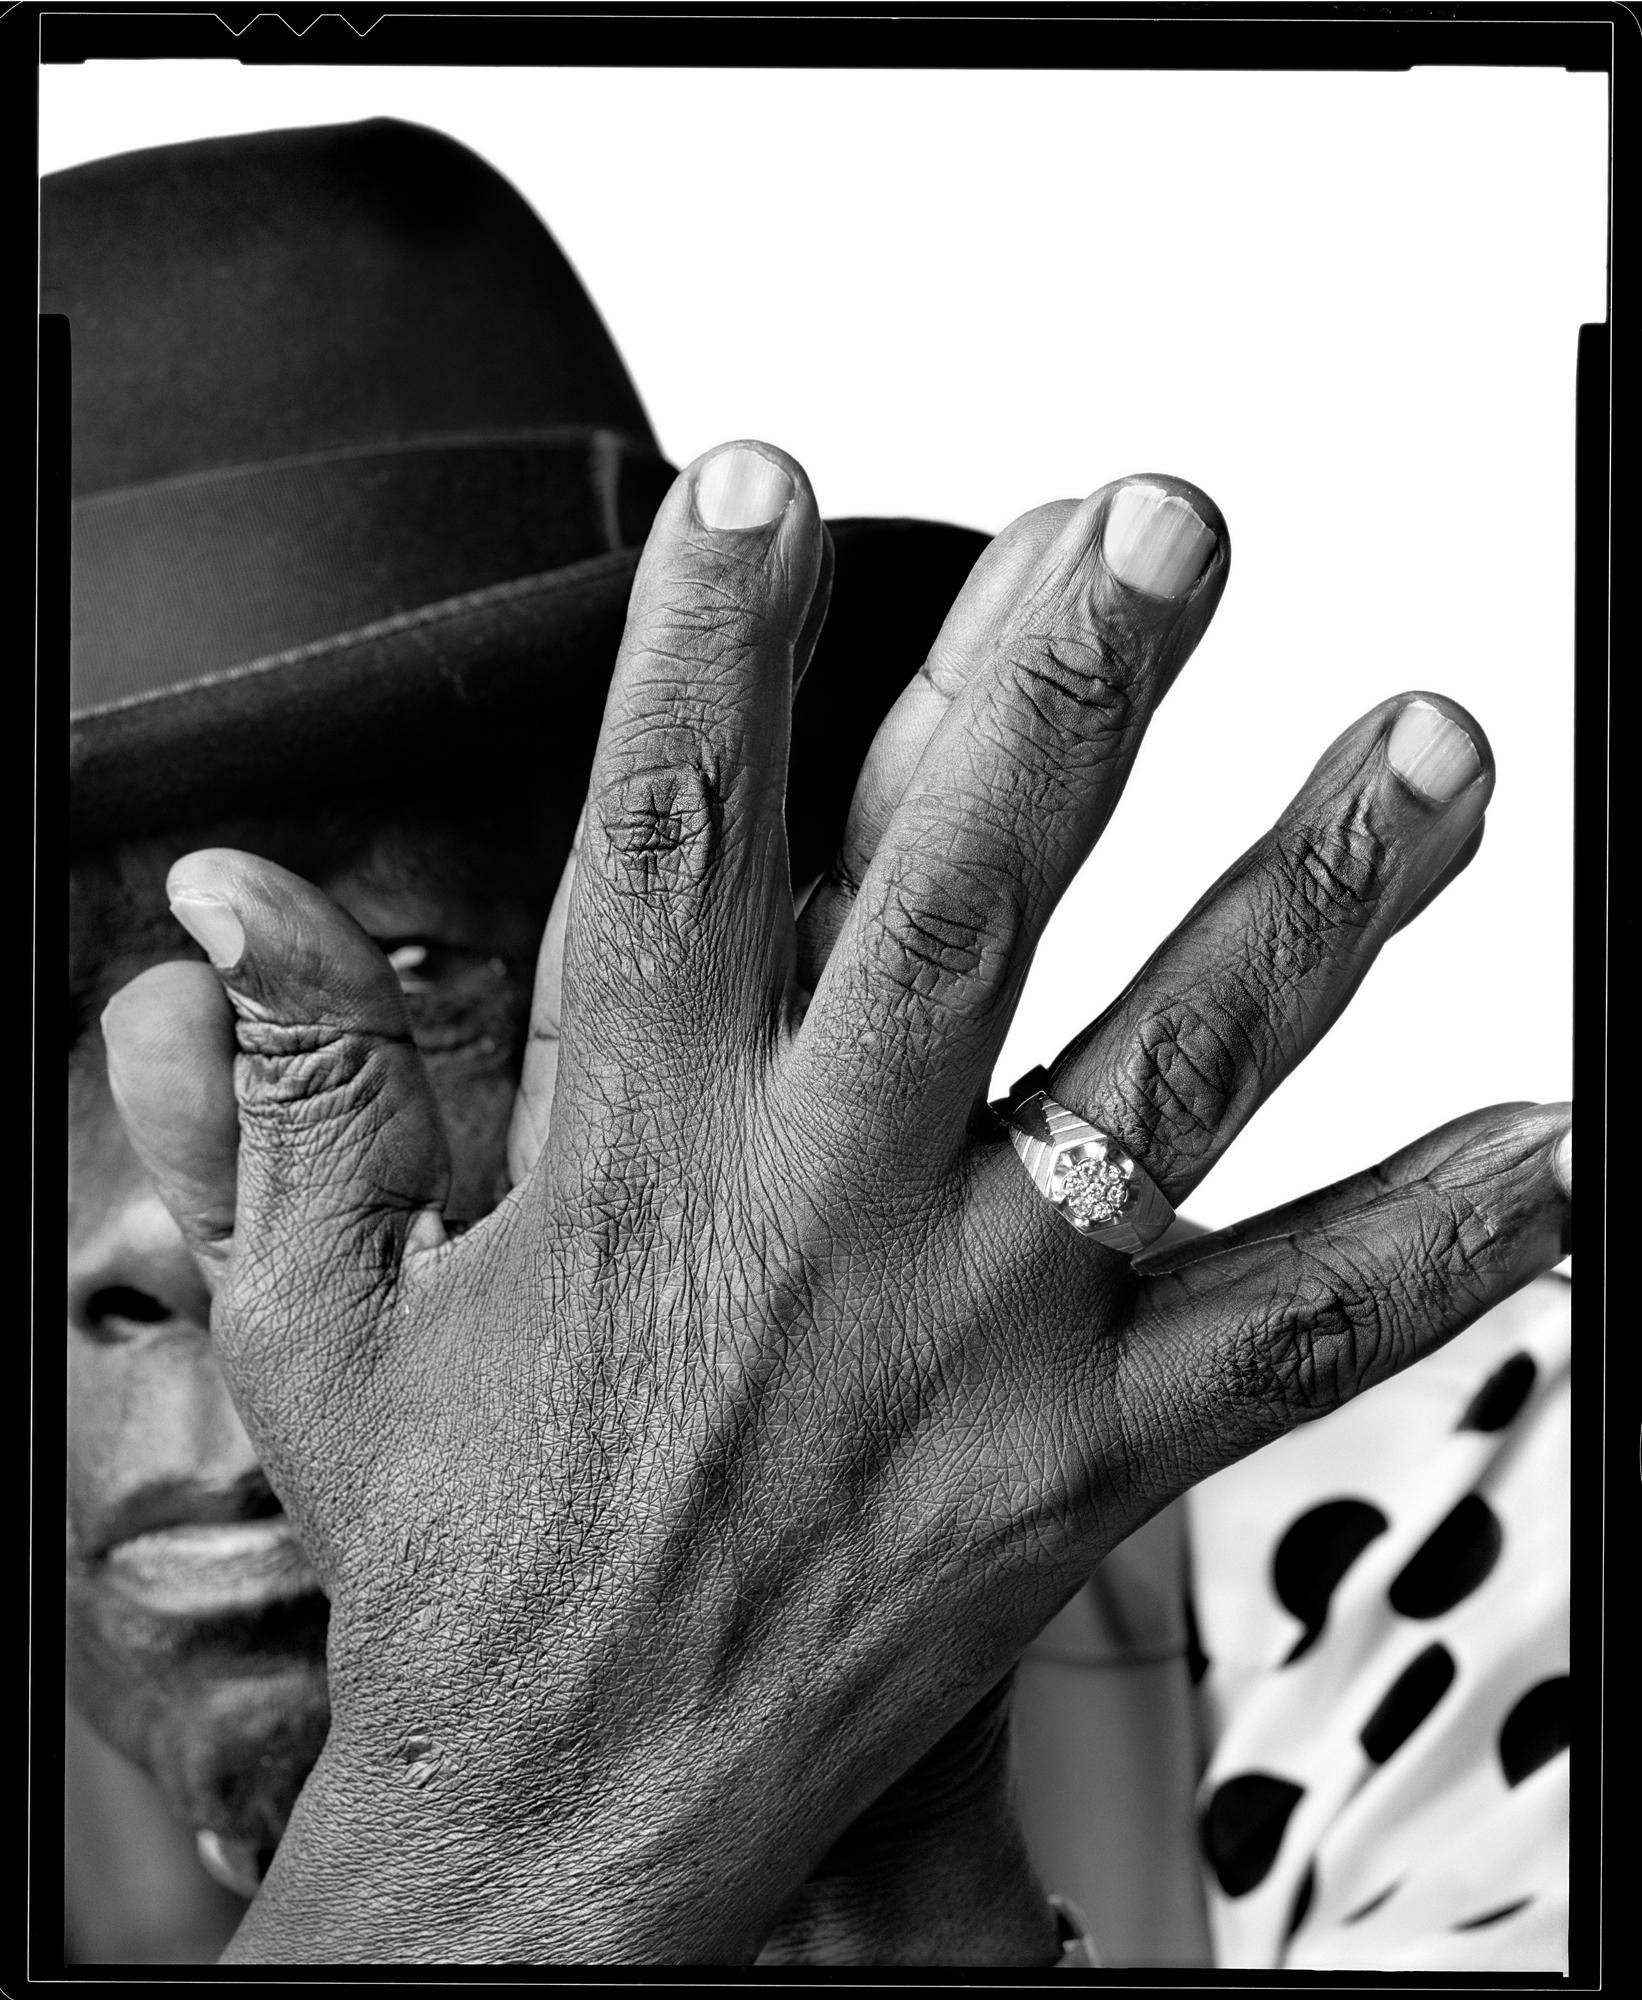 John Lee Hooker, Vallejo, CA, 1990 photograph by Mark Seliger